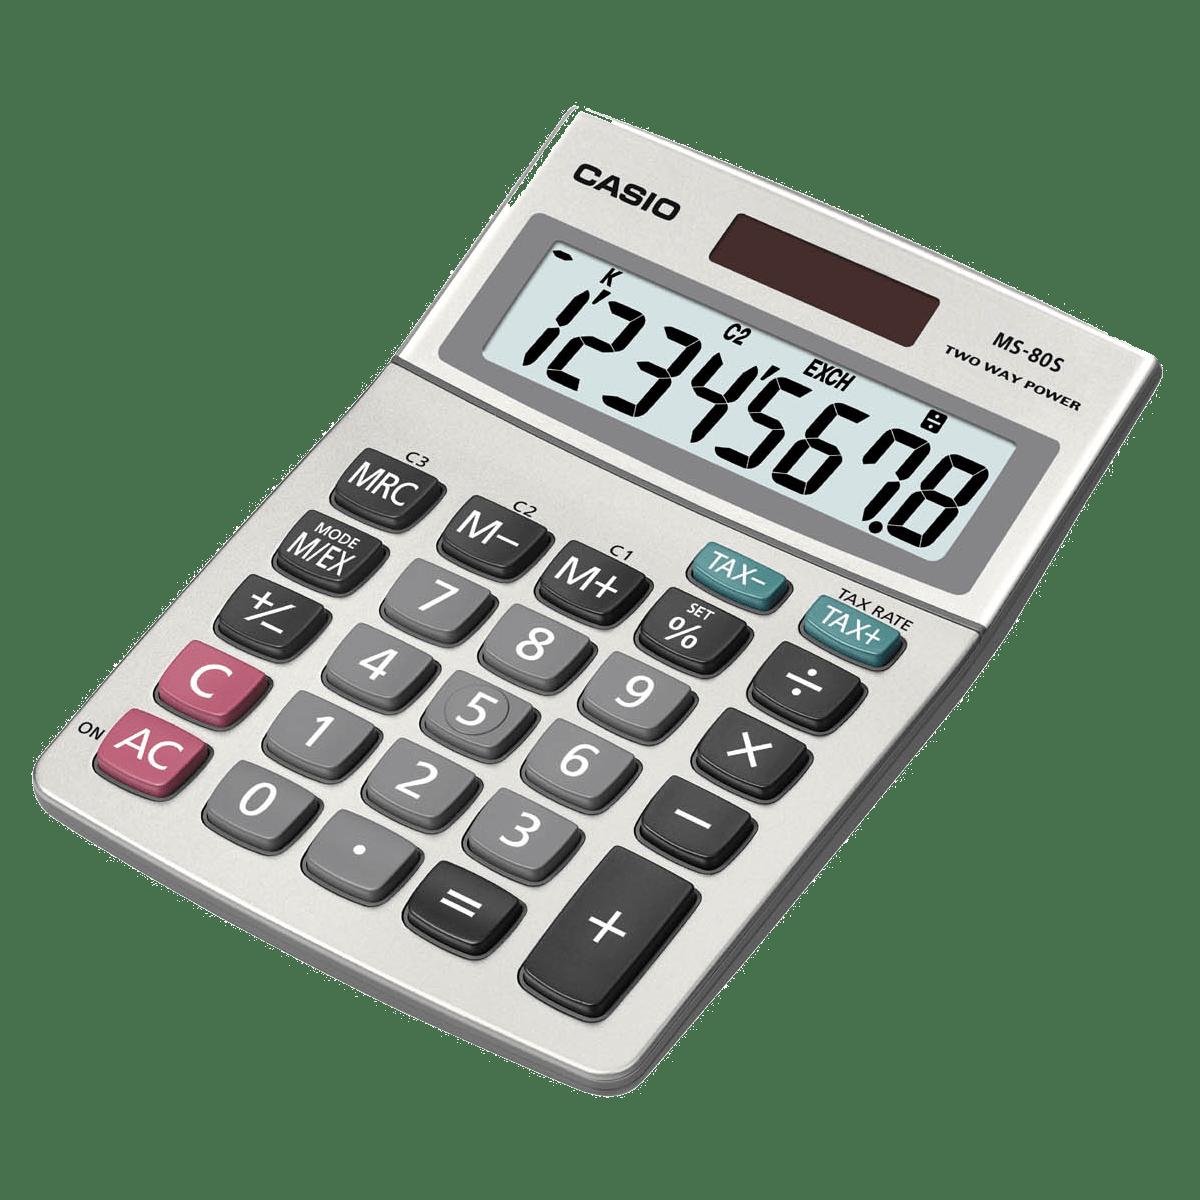 Calculator Transparent Gallery